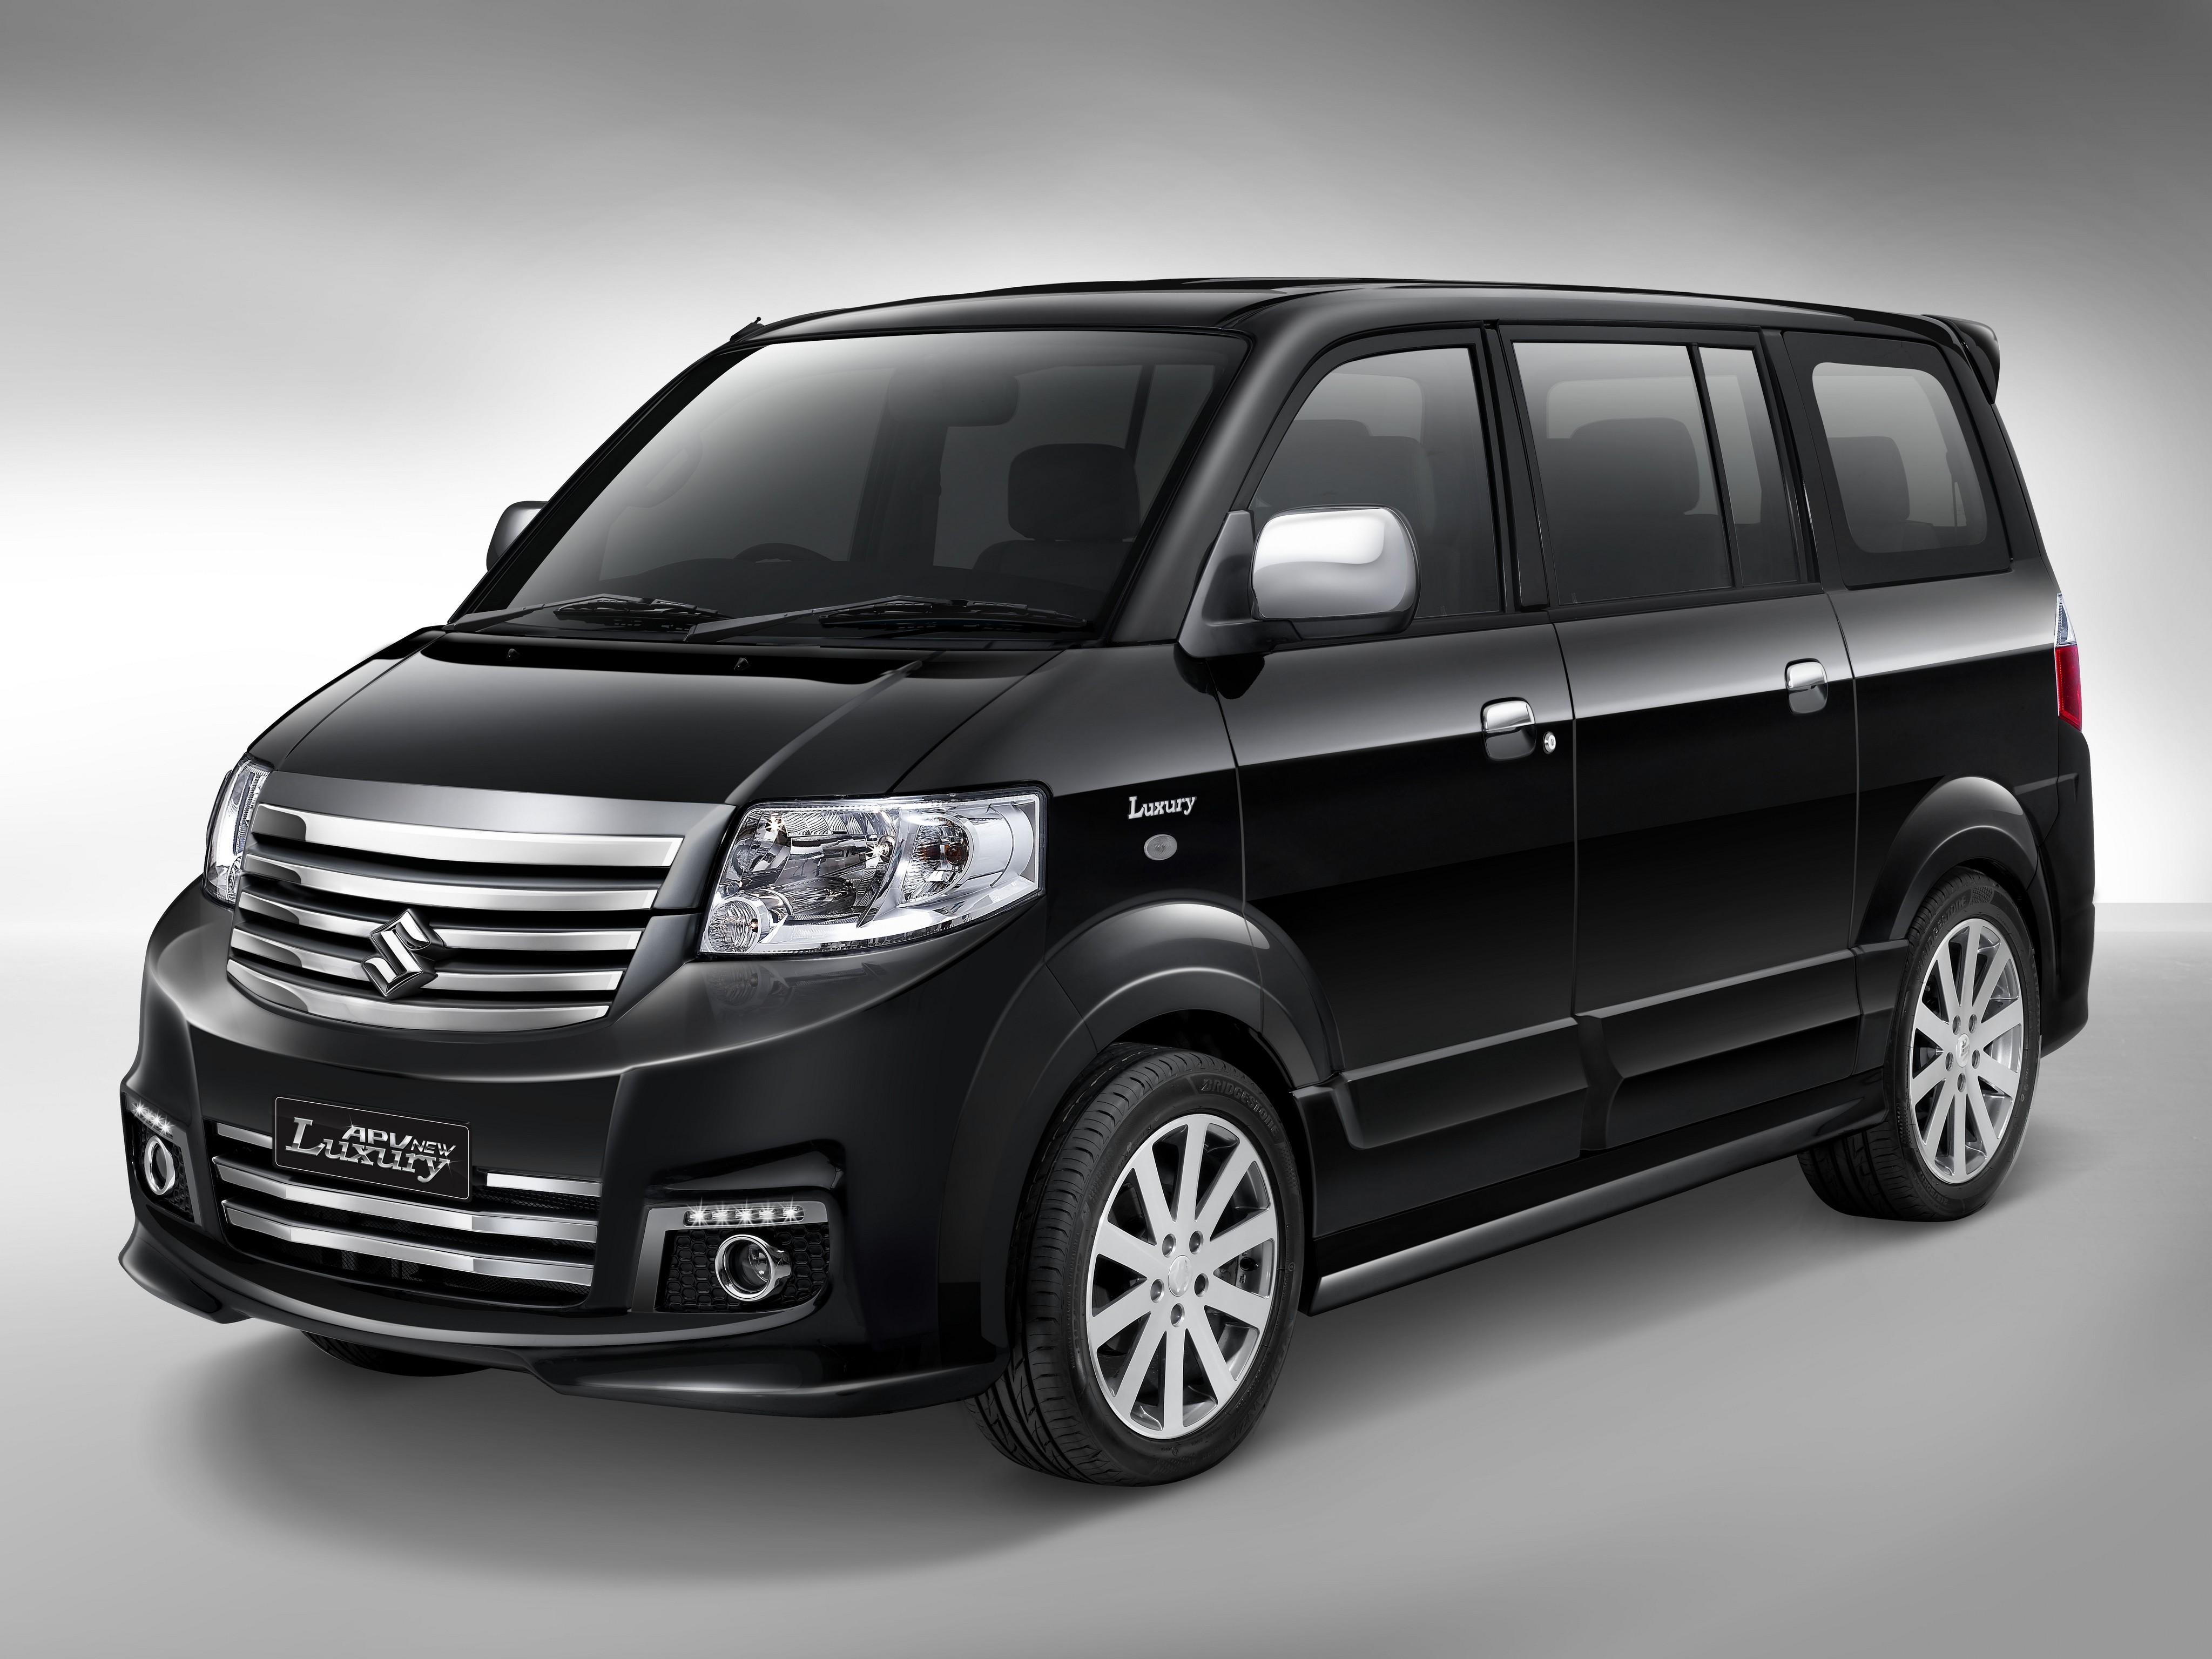 Suzuki Apv Indonesia